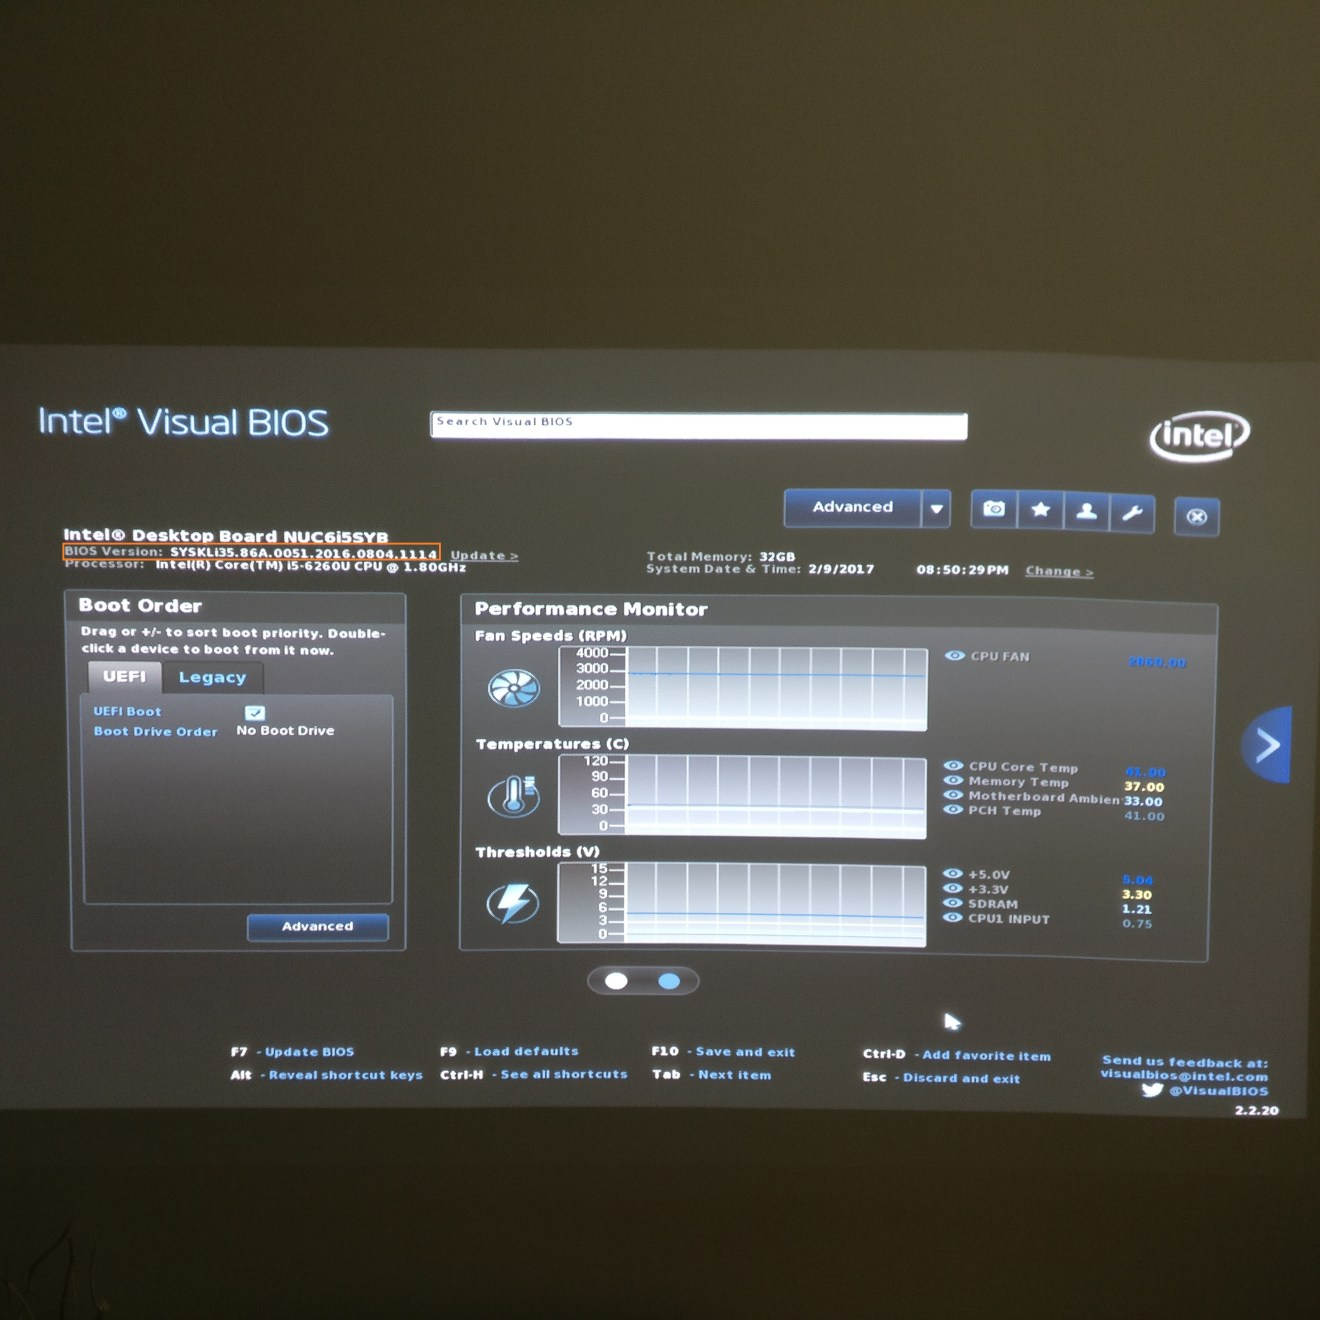 domalab.com Intel NUC BIOS visual